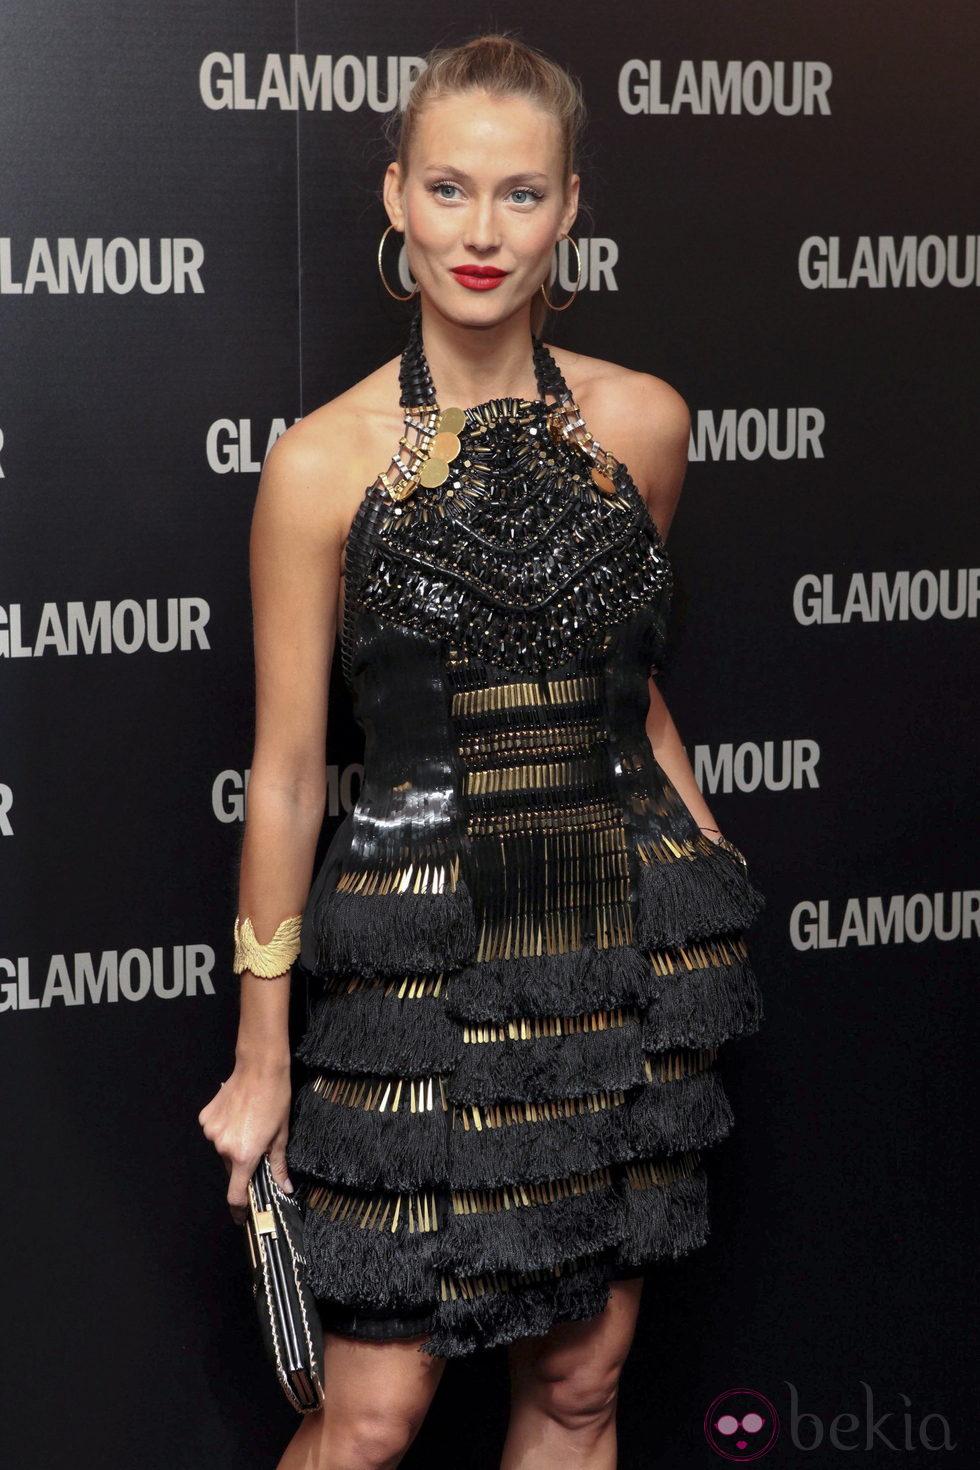 Vanessa Lorenzo en los Premios Glamour 2011